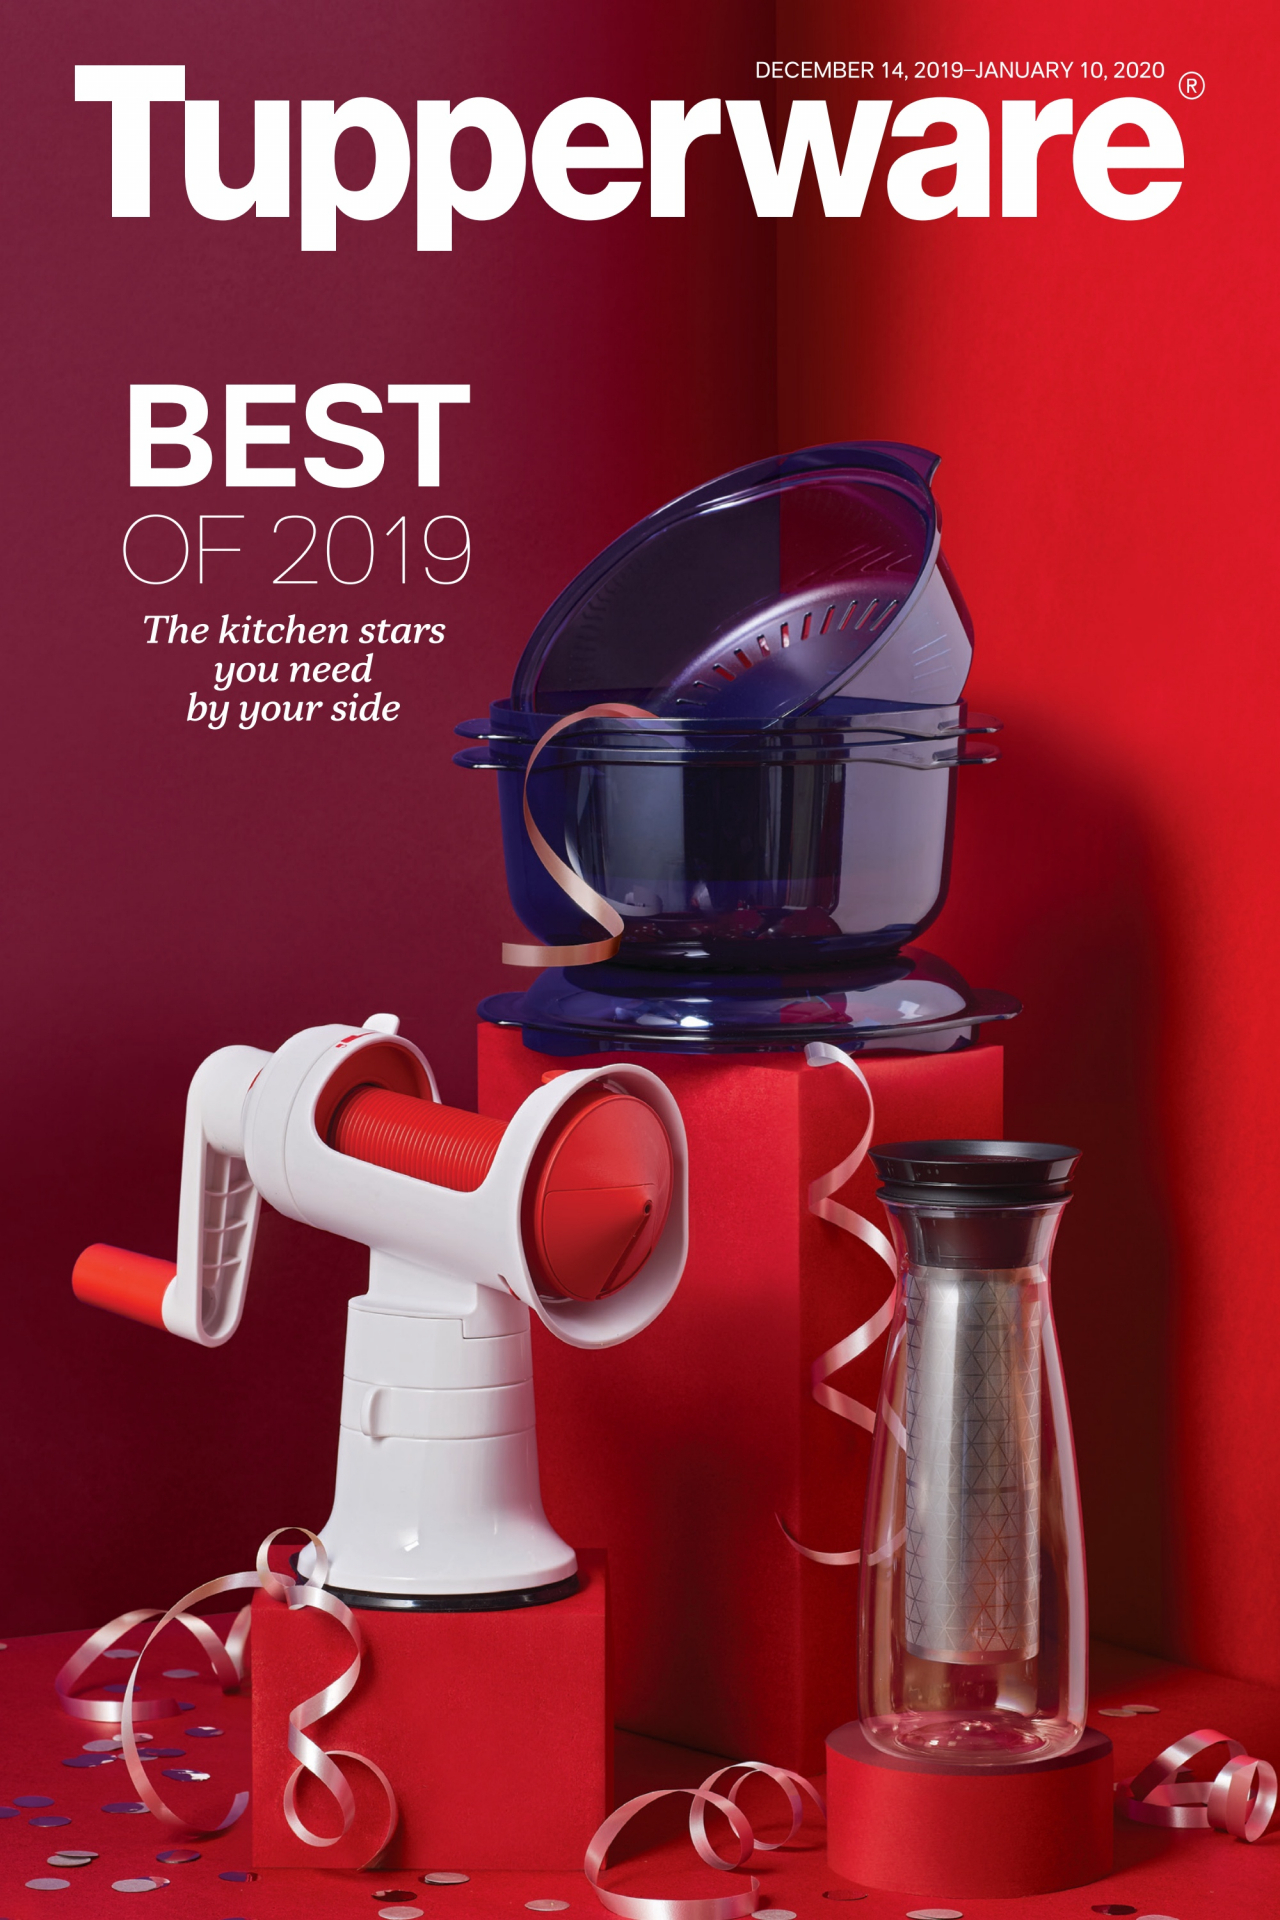 Tupperware Brochure – Valid Dec 14, 2019  Jan 10, 2020 inside Tupperware Jan 2020